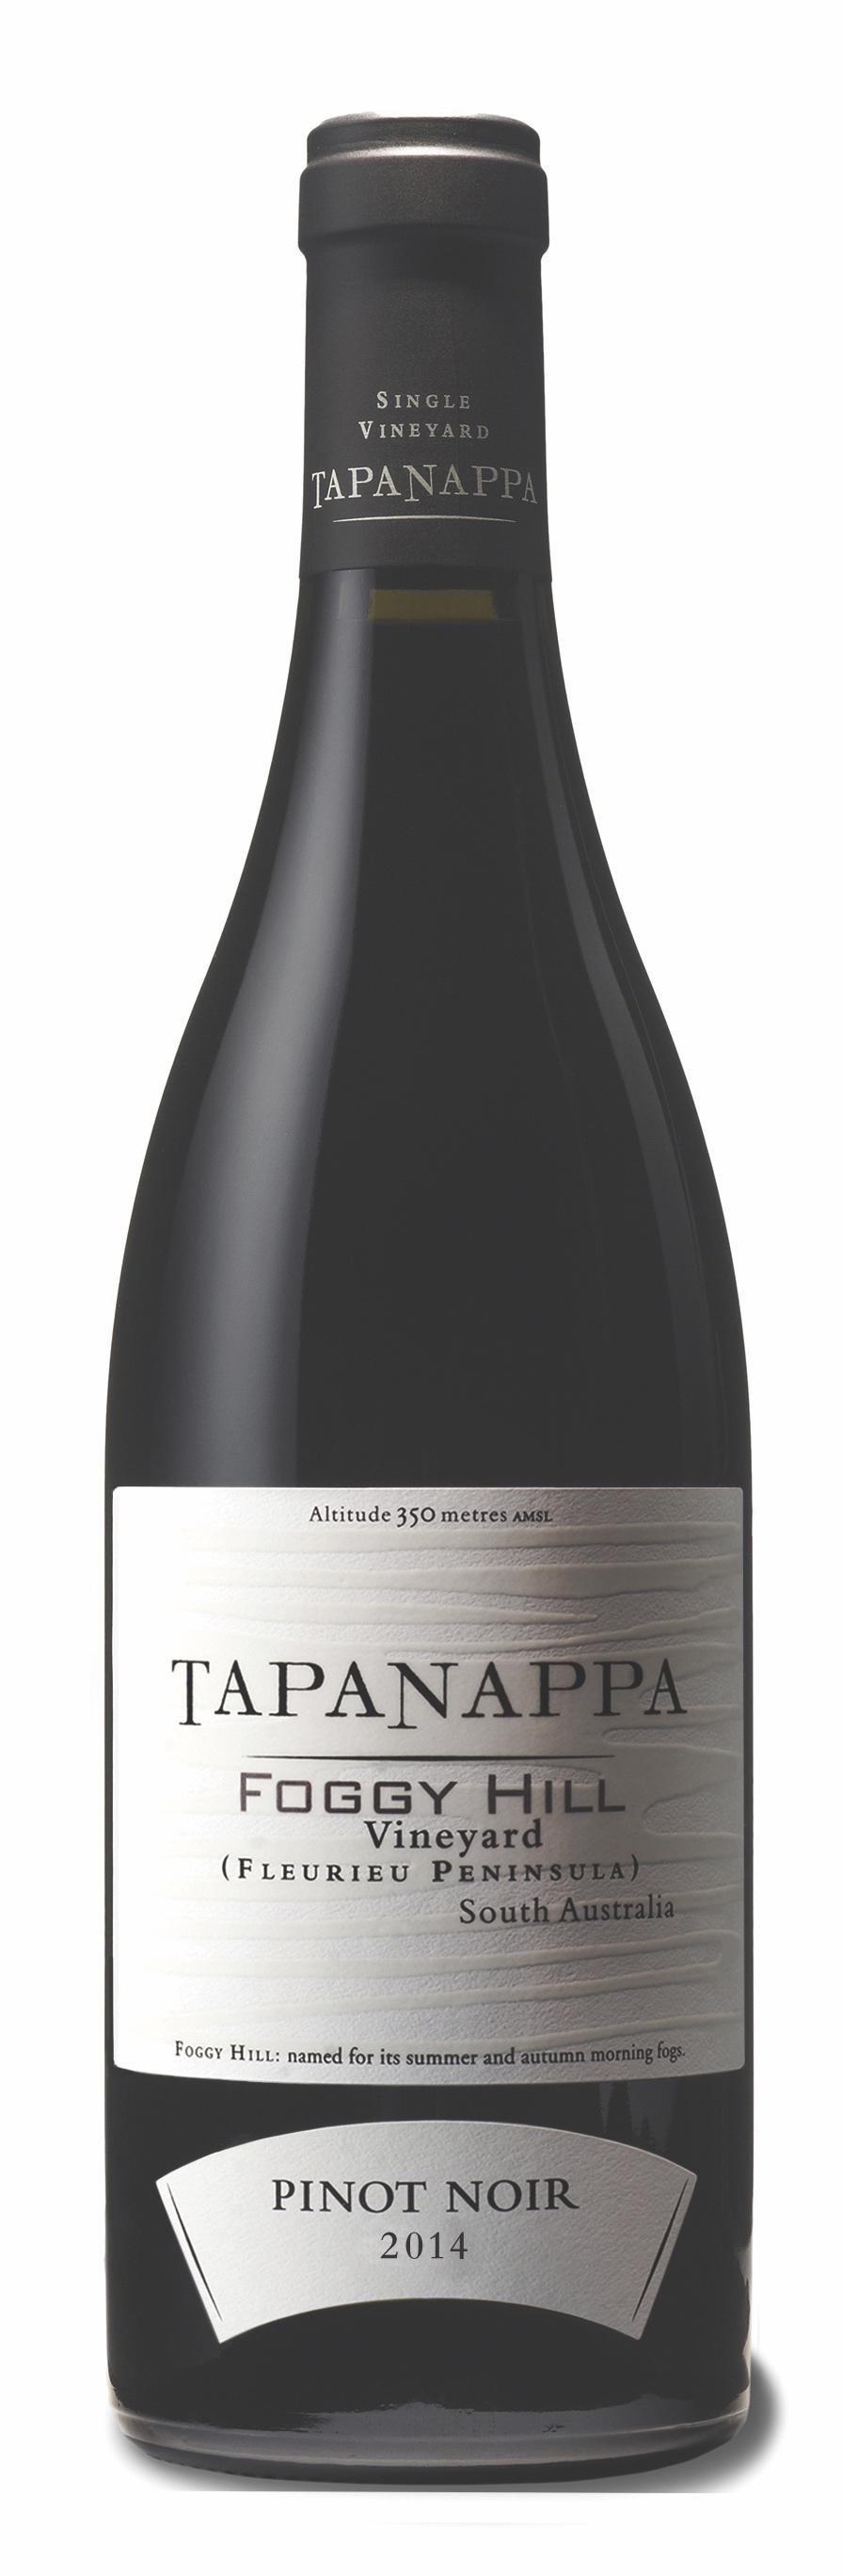 Tapanappa Foggy Hill Vineyard 2014 Pinot Noir bottle image